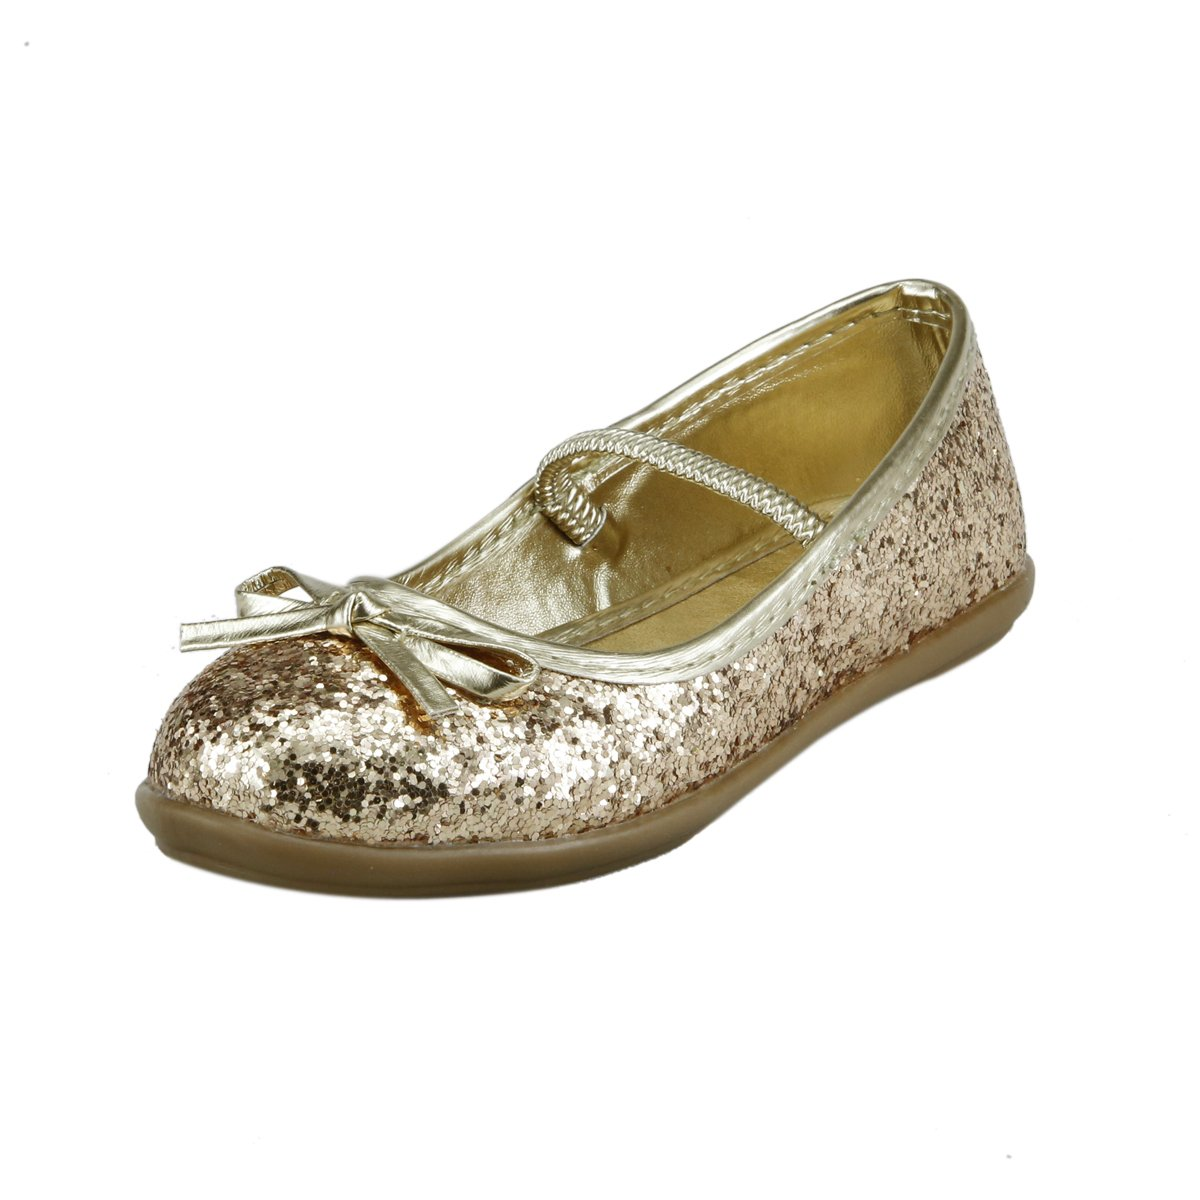 Wedding Flower Girl's Glitter Sparkly Ballet Flat Shoes w/ Elastic Strap Toddler Size (11, Gold)